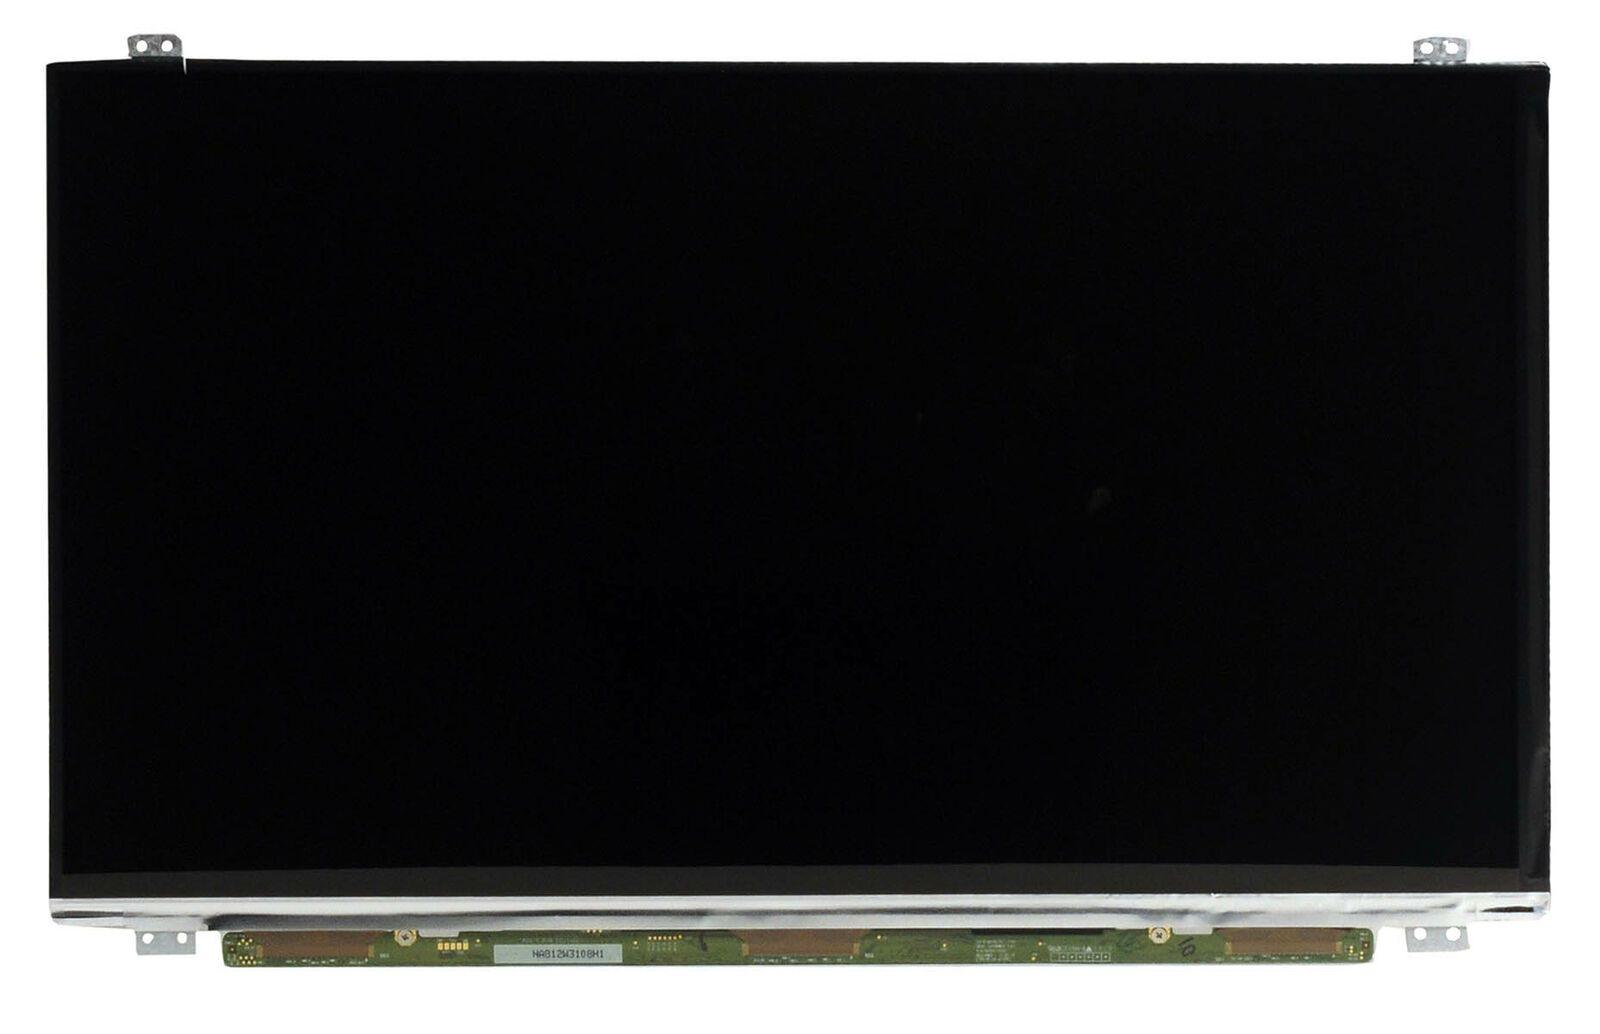 Tela 15.6 Led Slim Para Asus U53 U50 E Ul50 Series 1366x768 40 pin - EASY HELP NOTE